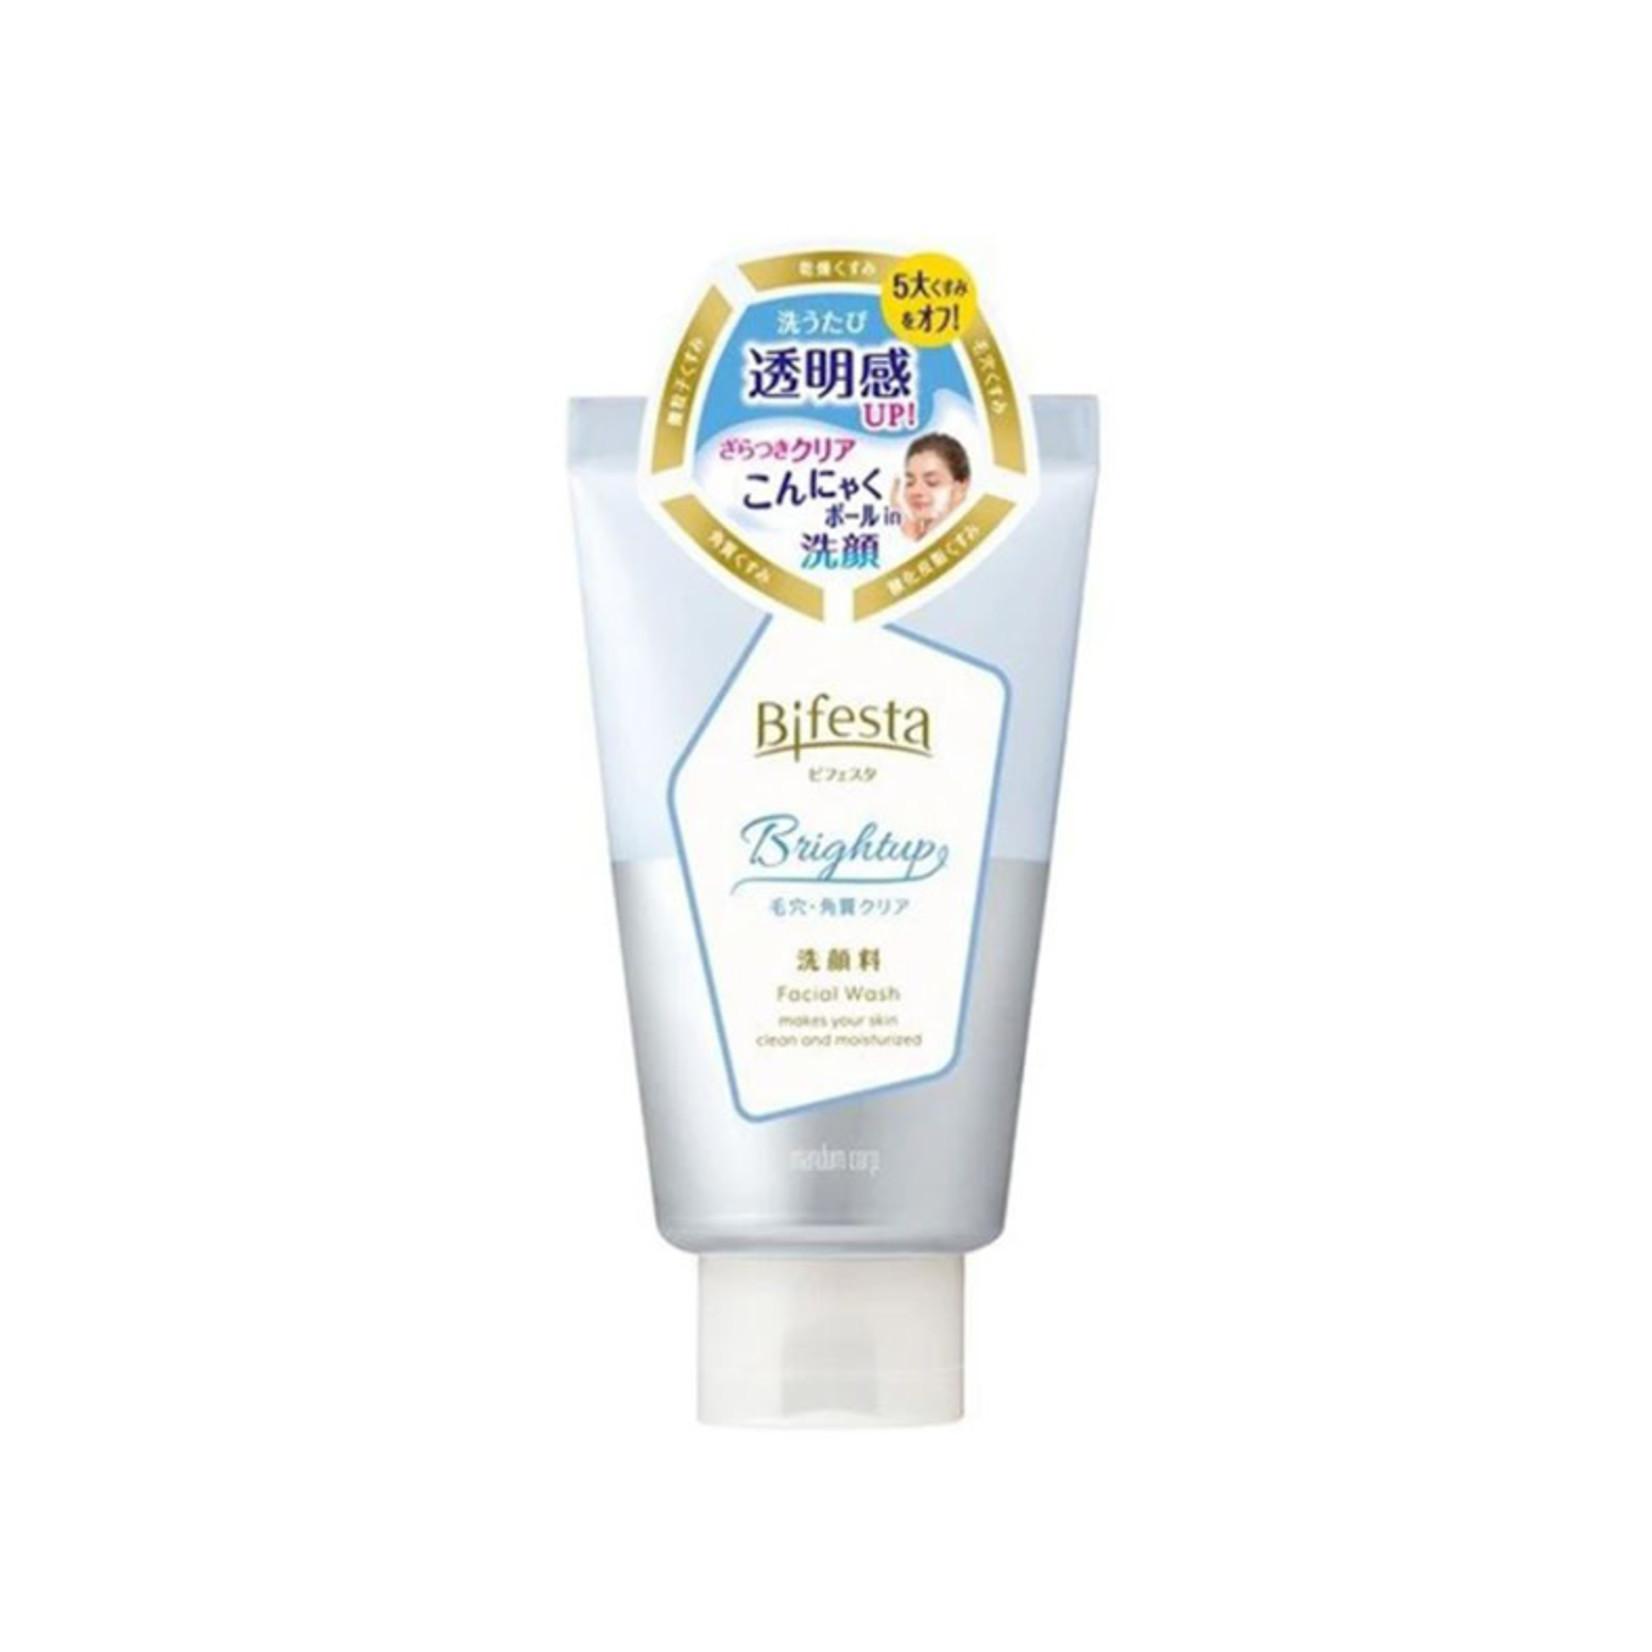 Mandom Bifesta Facial Wash Moist Brightup